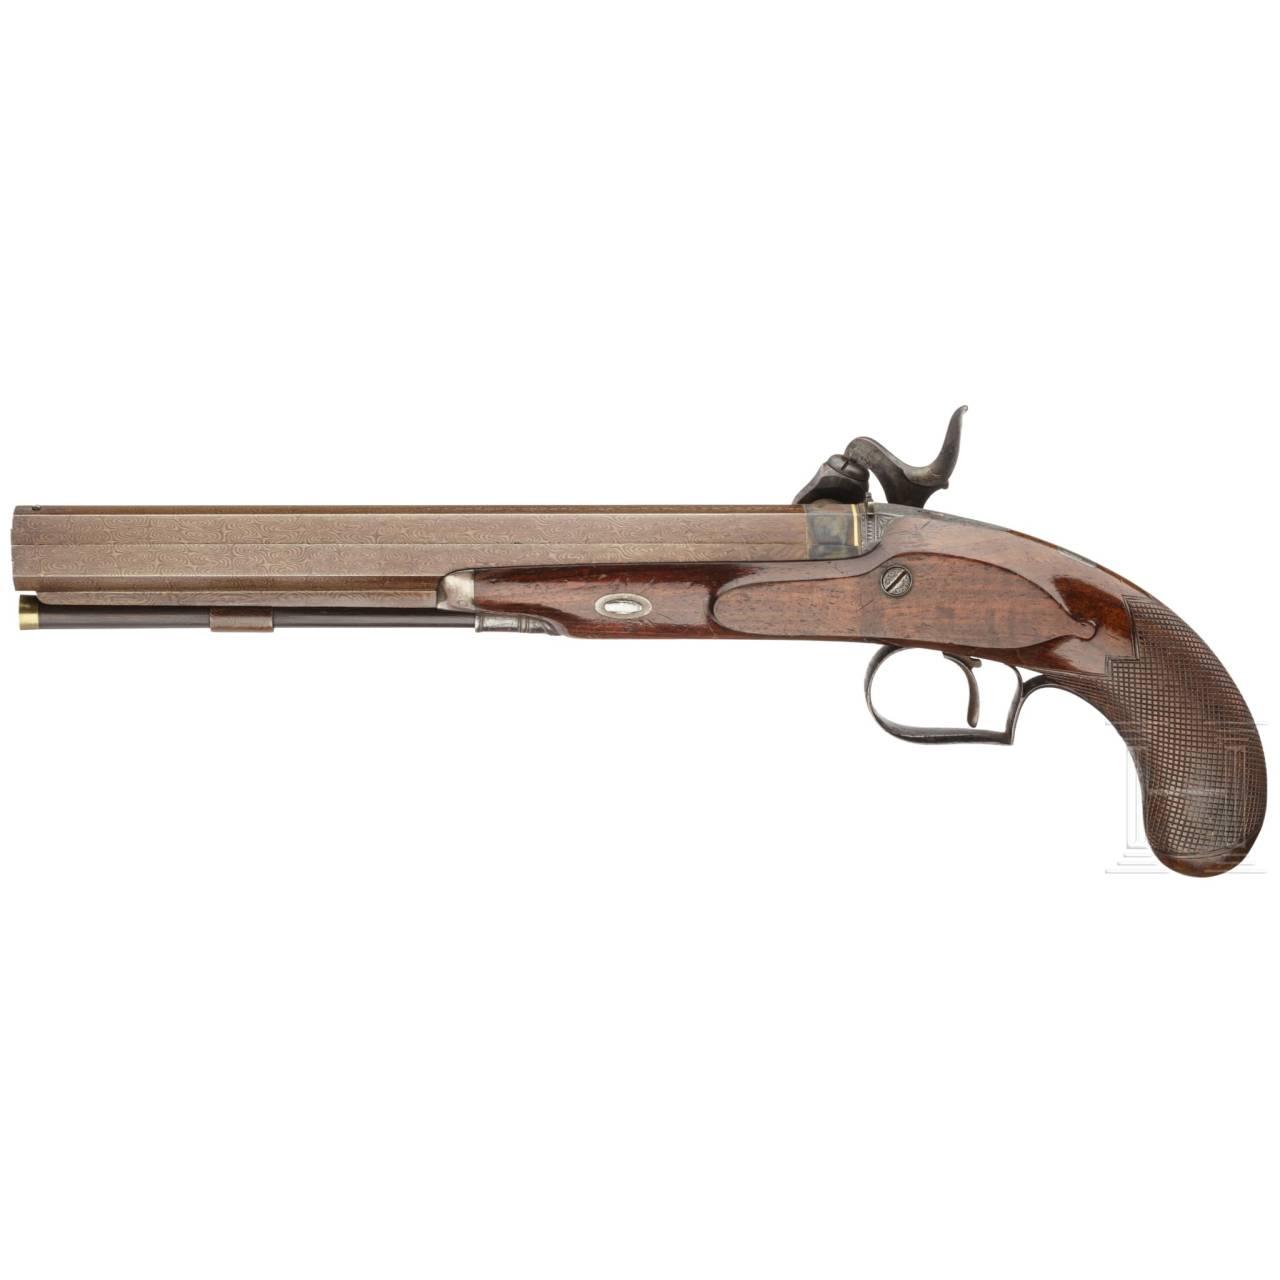 A pistol with a Forsyth firing system, Forsyth & Co, London, circa 1820